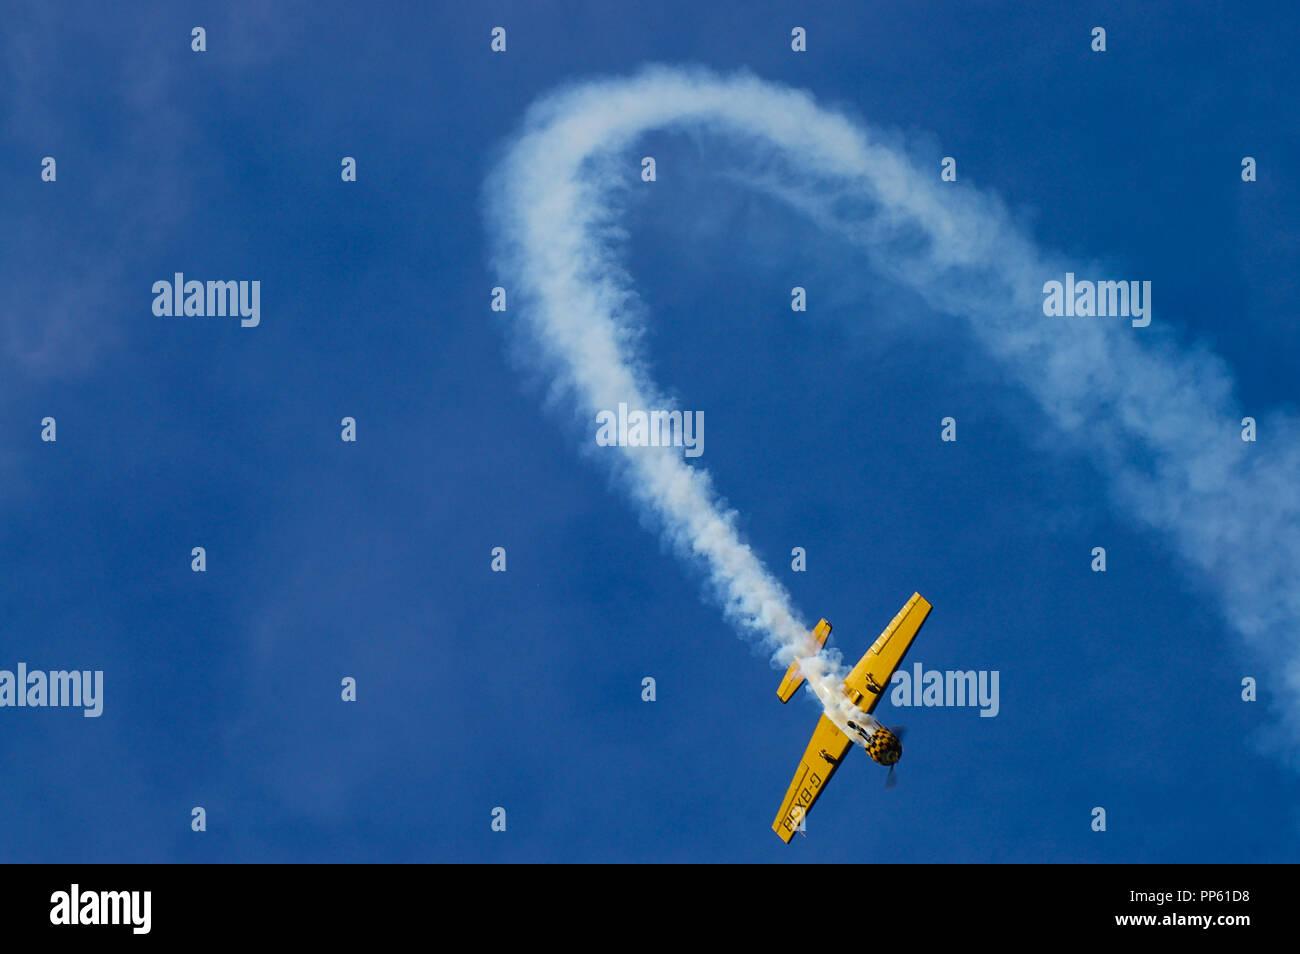 Yakovlev Yak-52 aerobatic plane arcing over with smoke trail in blue sky. Flying aerobatics. Loop the loop. Looping. Space for copy - Stock Image